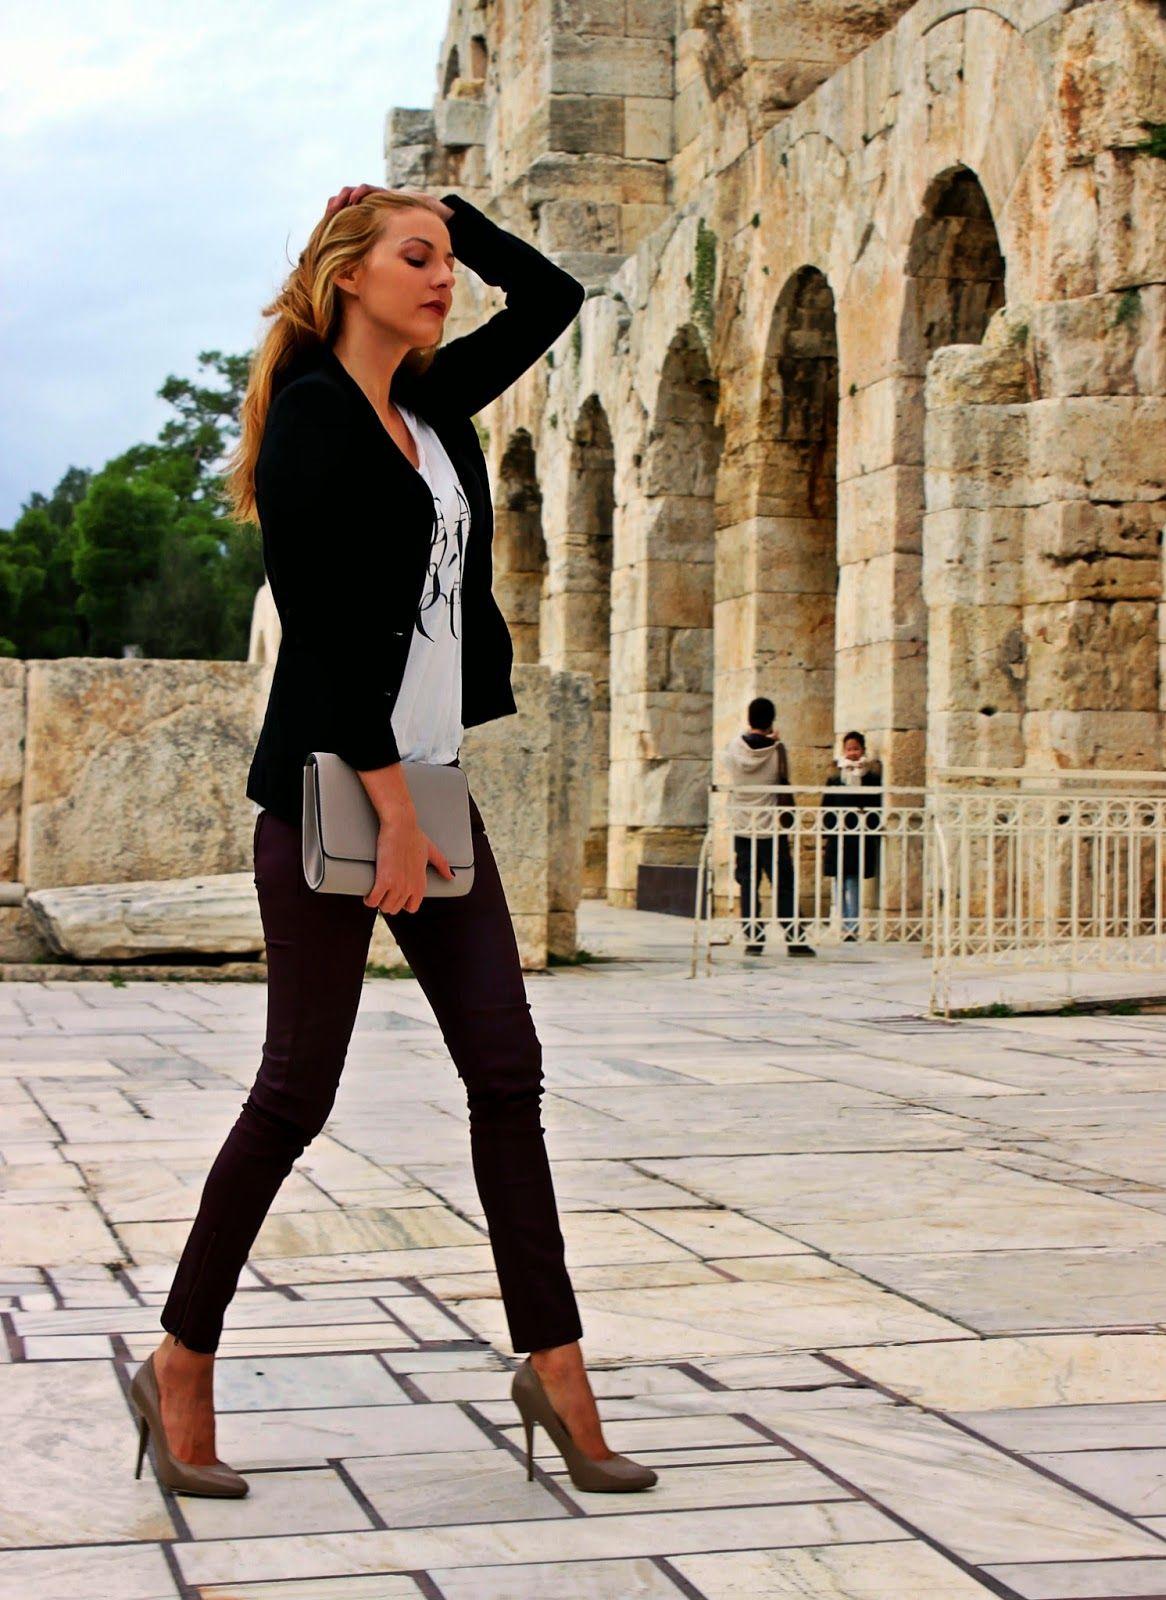 Black t shirt grey pants - Women S Black Blazer White And Black Print Crew Neck T Shirt Burgundy Skinny Pants Brown Leather Pumps